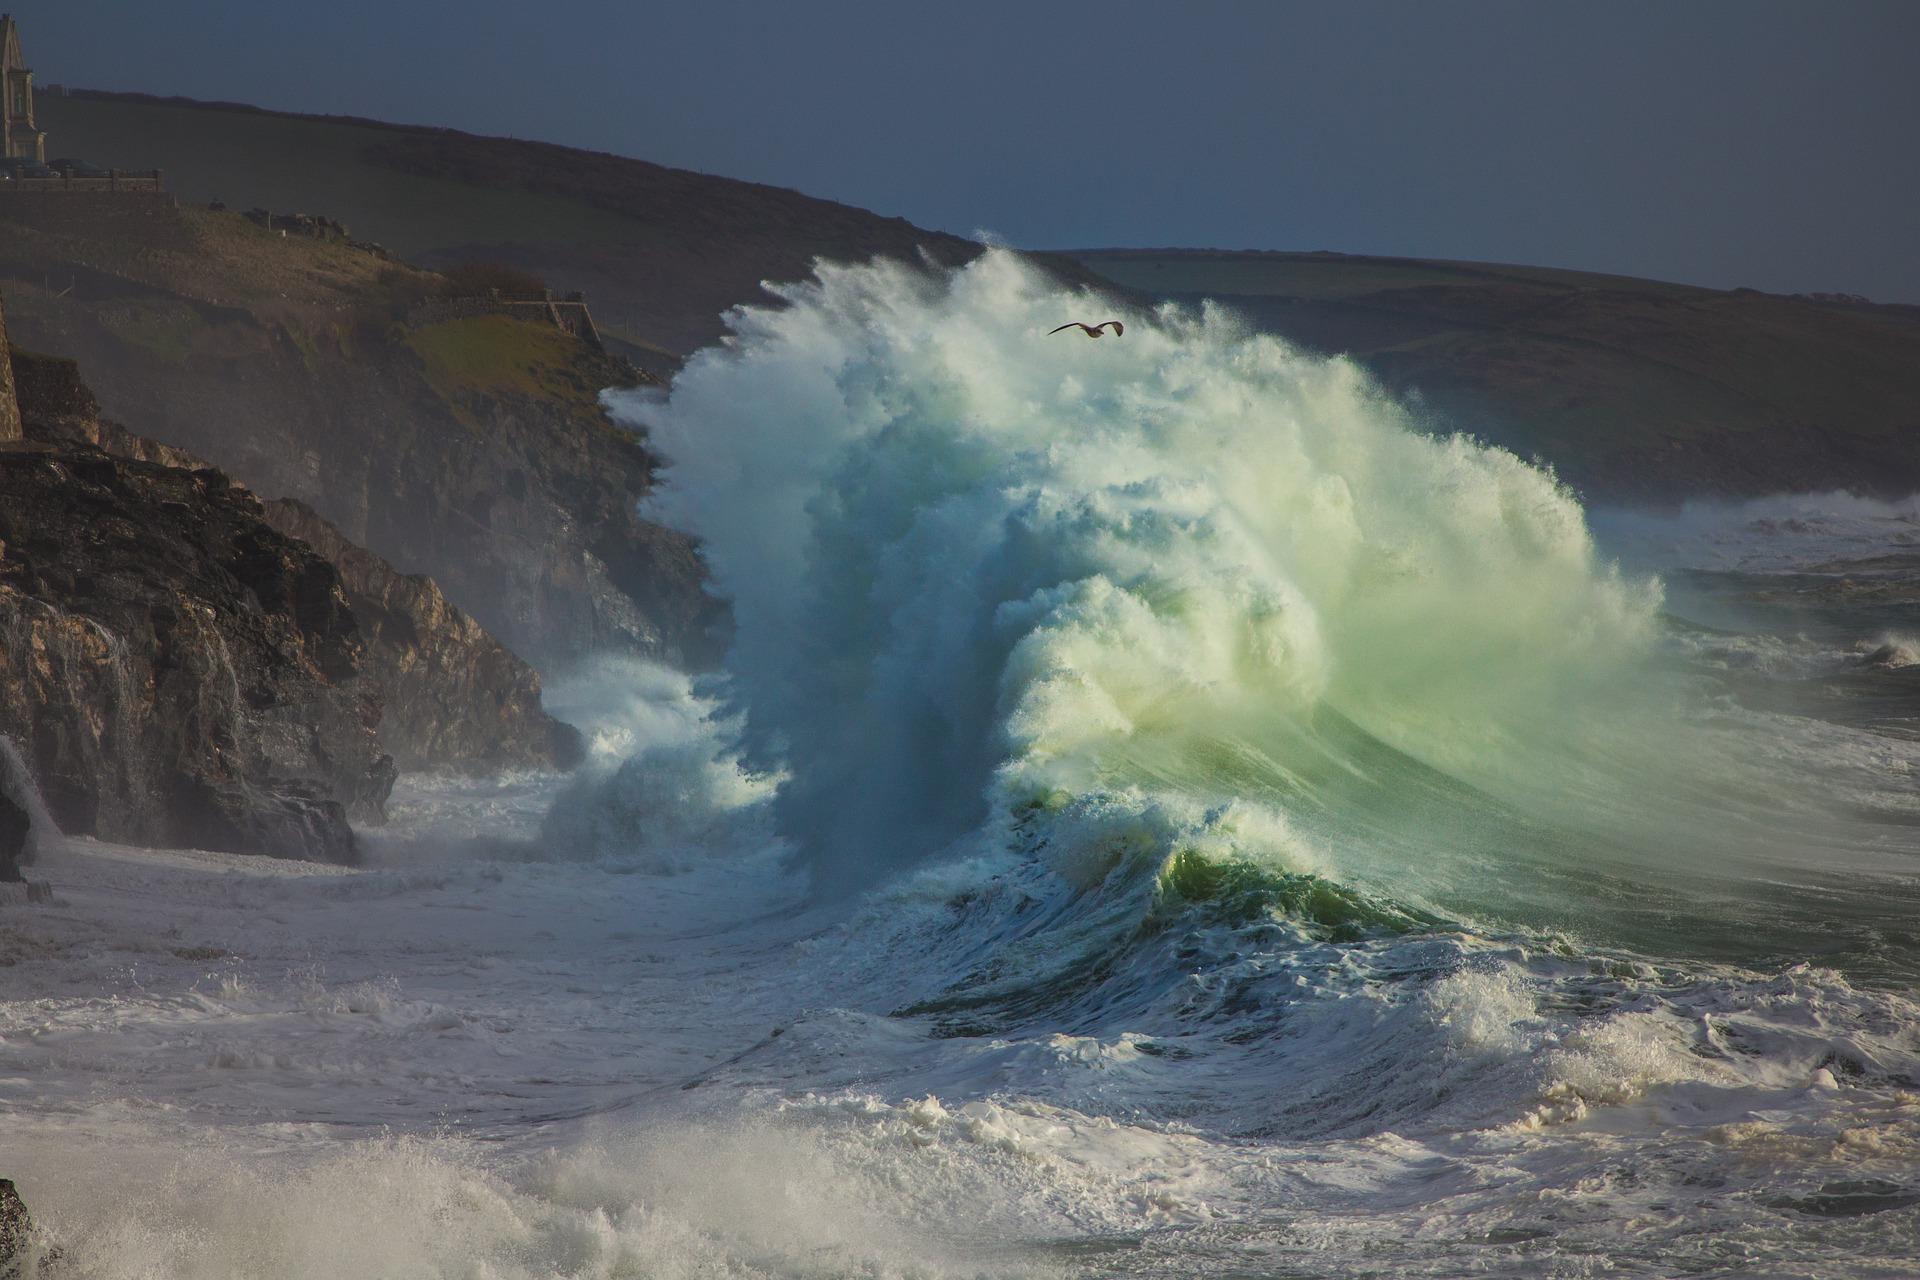 Coastal Protection and Legislation